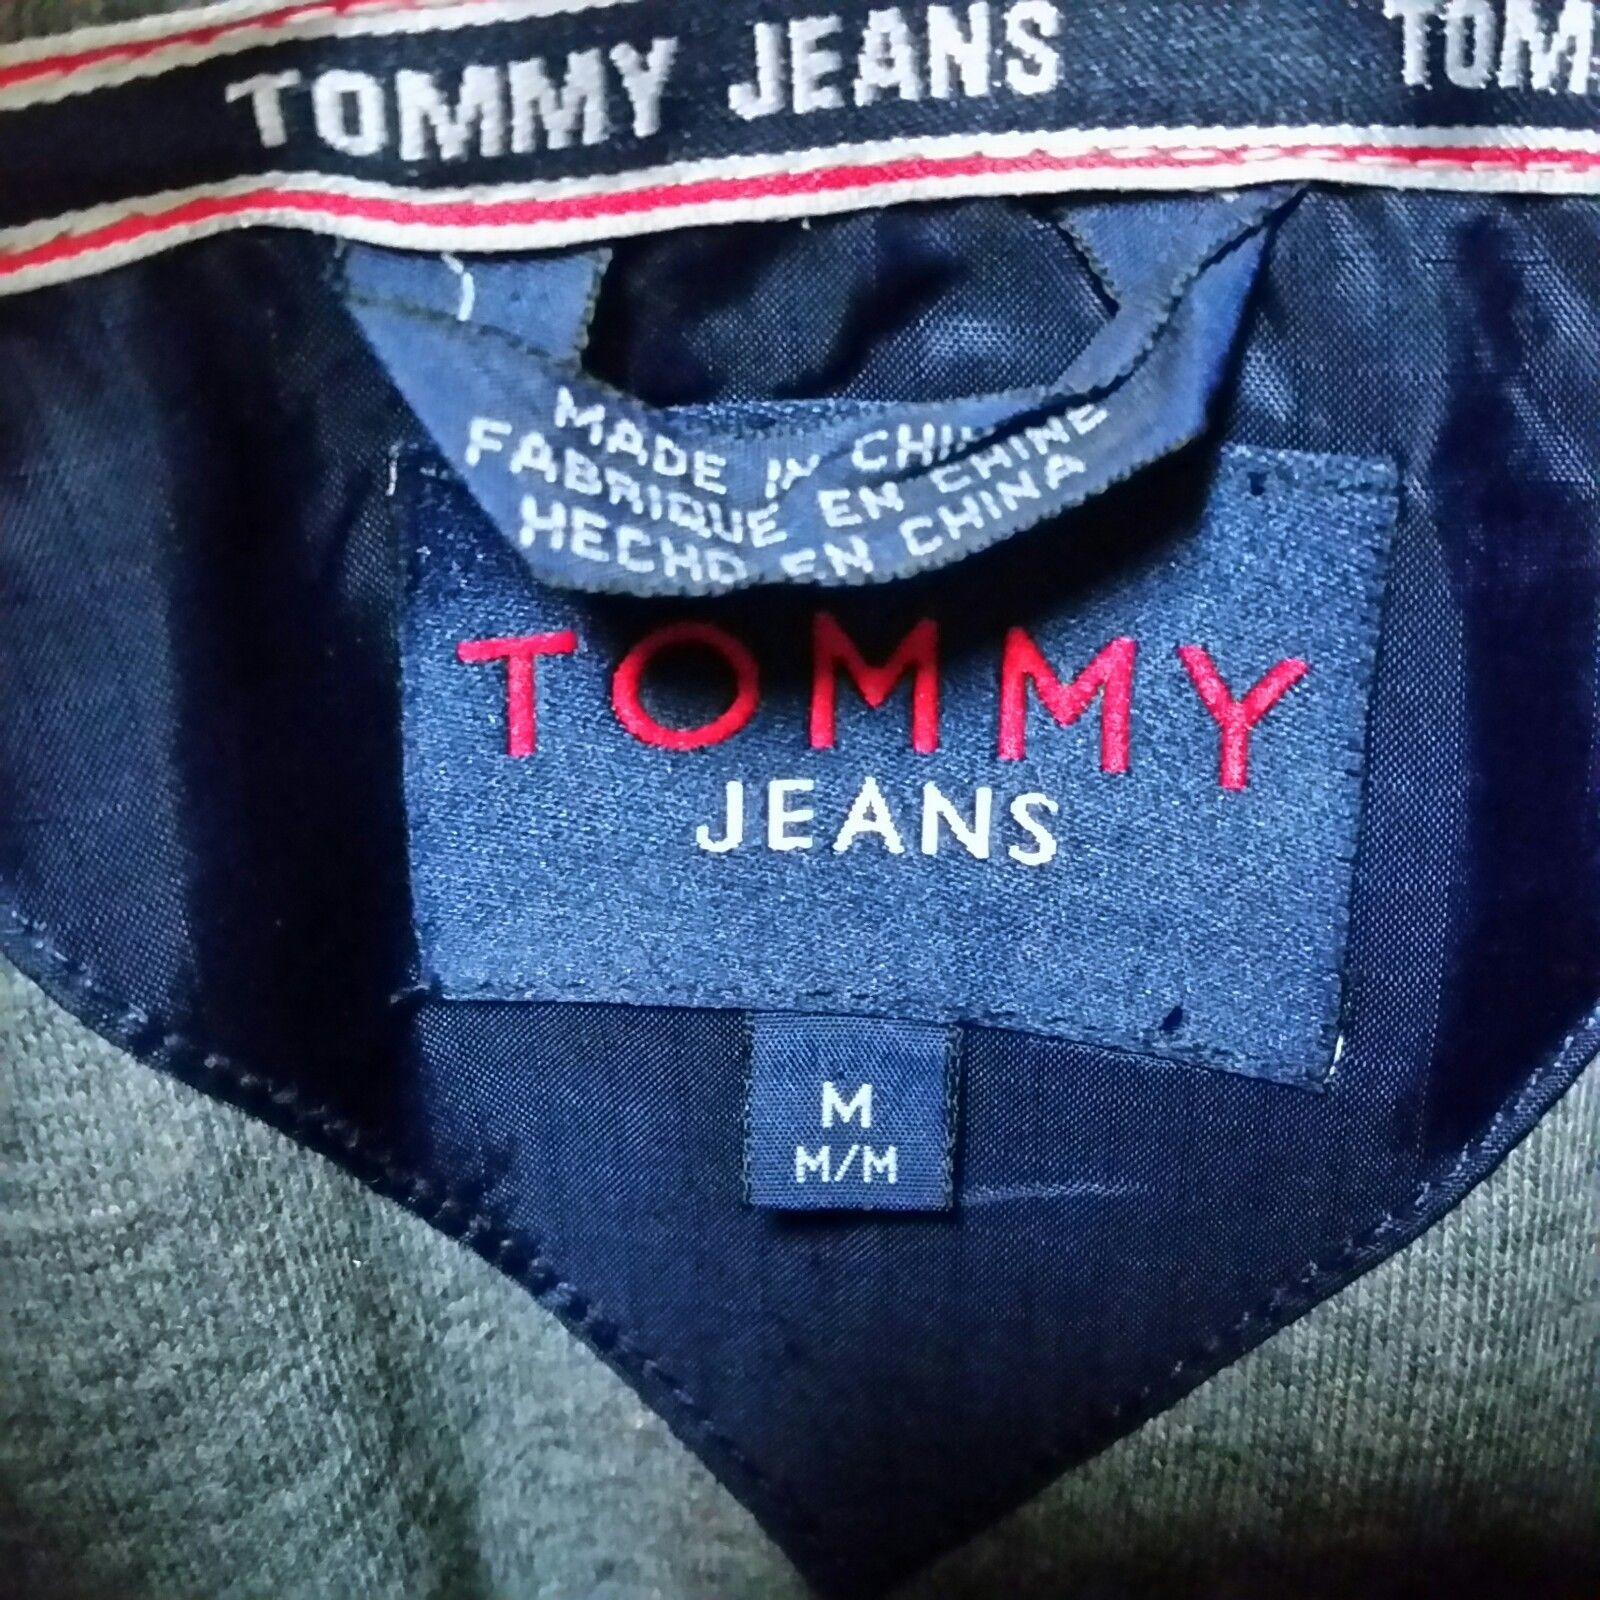 VTG 90s Tommy Hilfiger Jeans Windbreaker Jacket Colorblock Sailing Coat Medium image 9